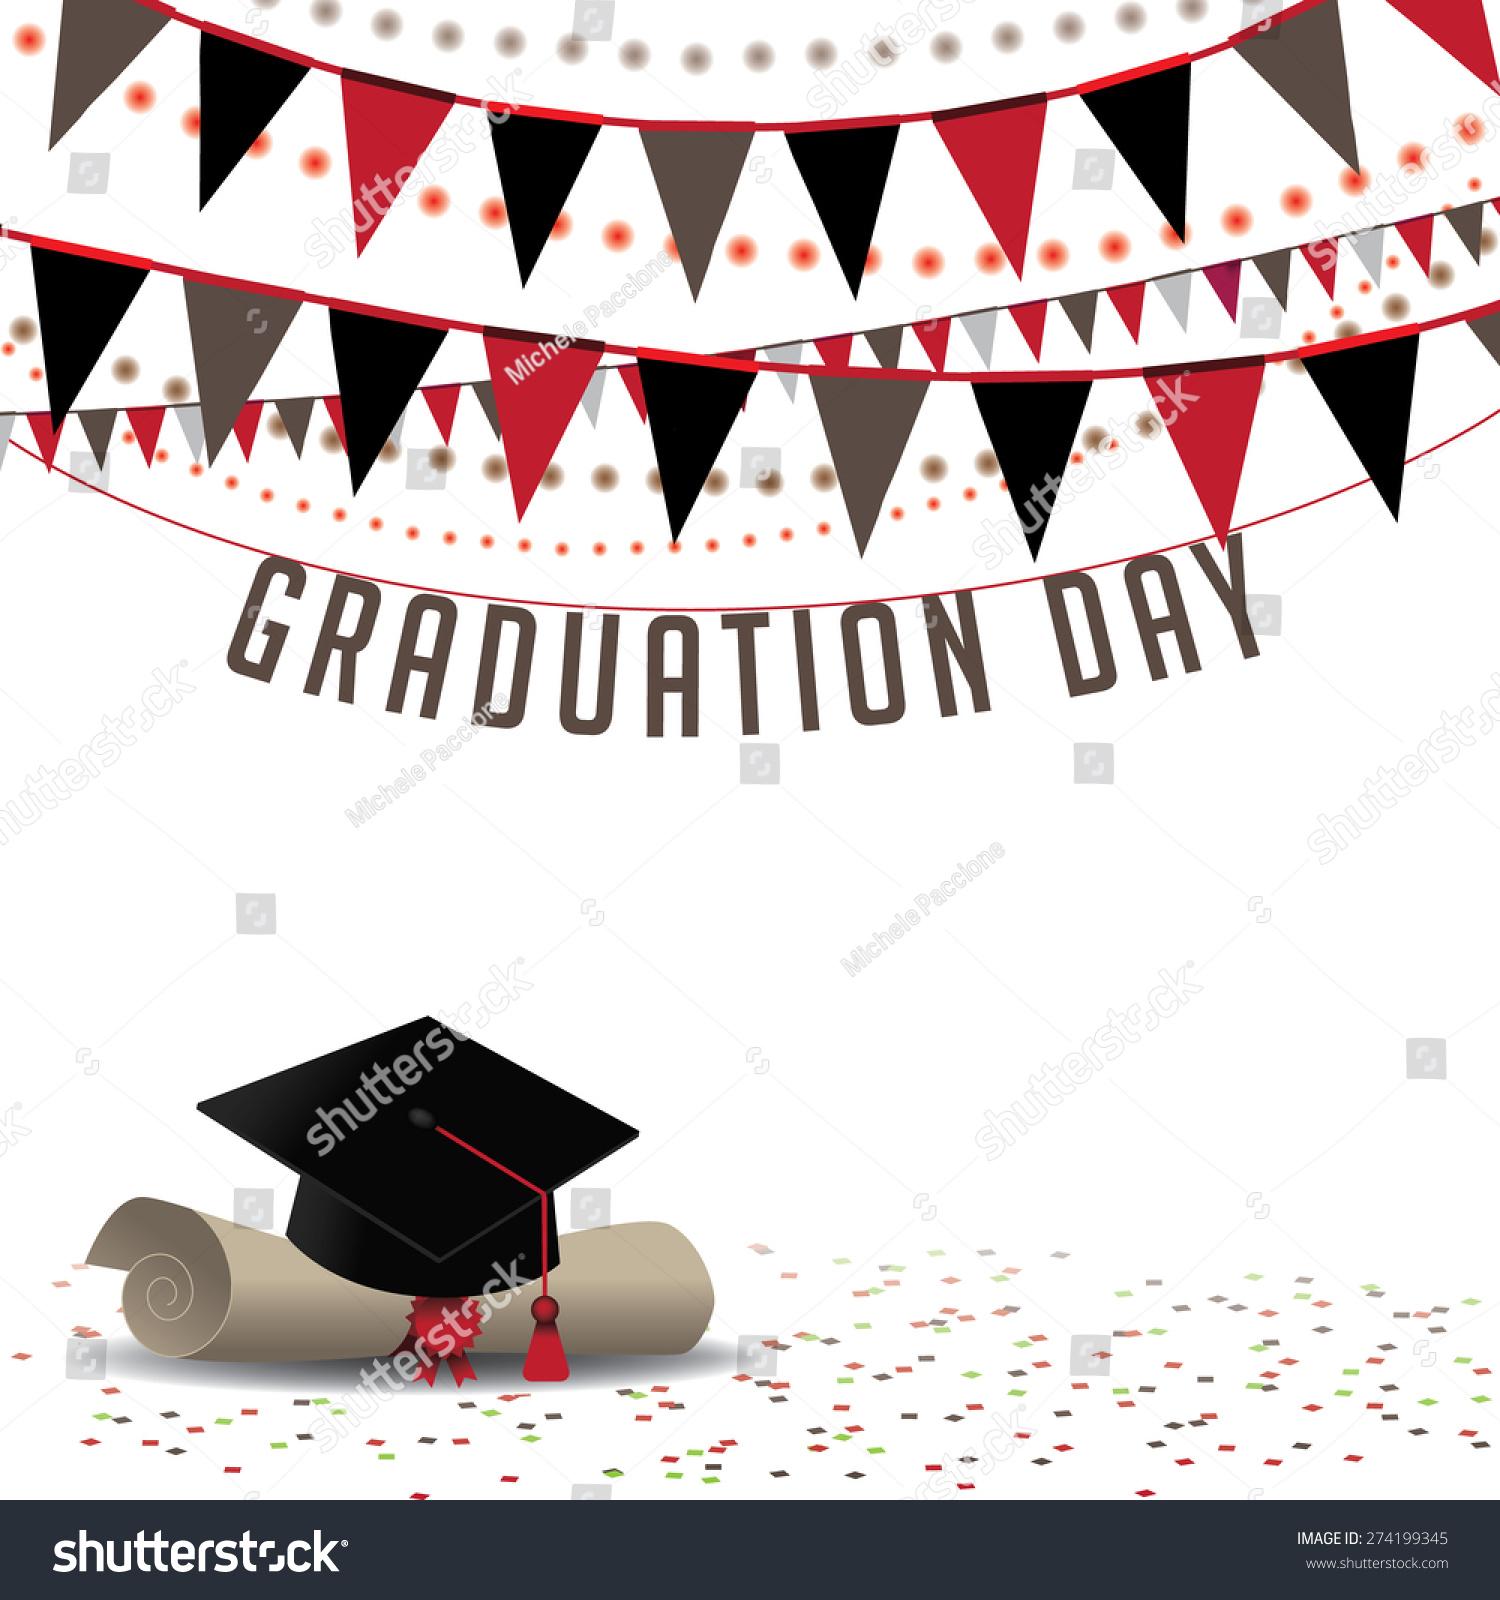 graduation day background eps 10 vector stock vector 274199345